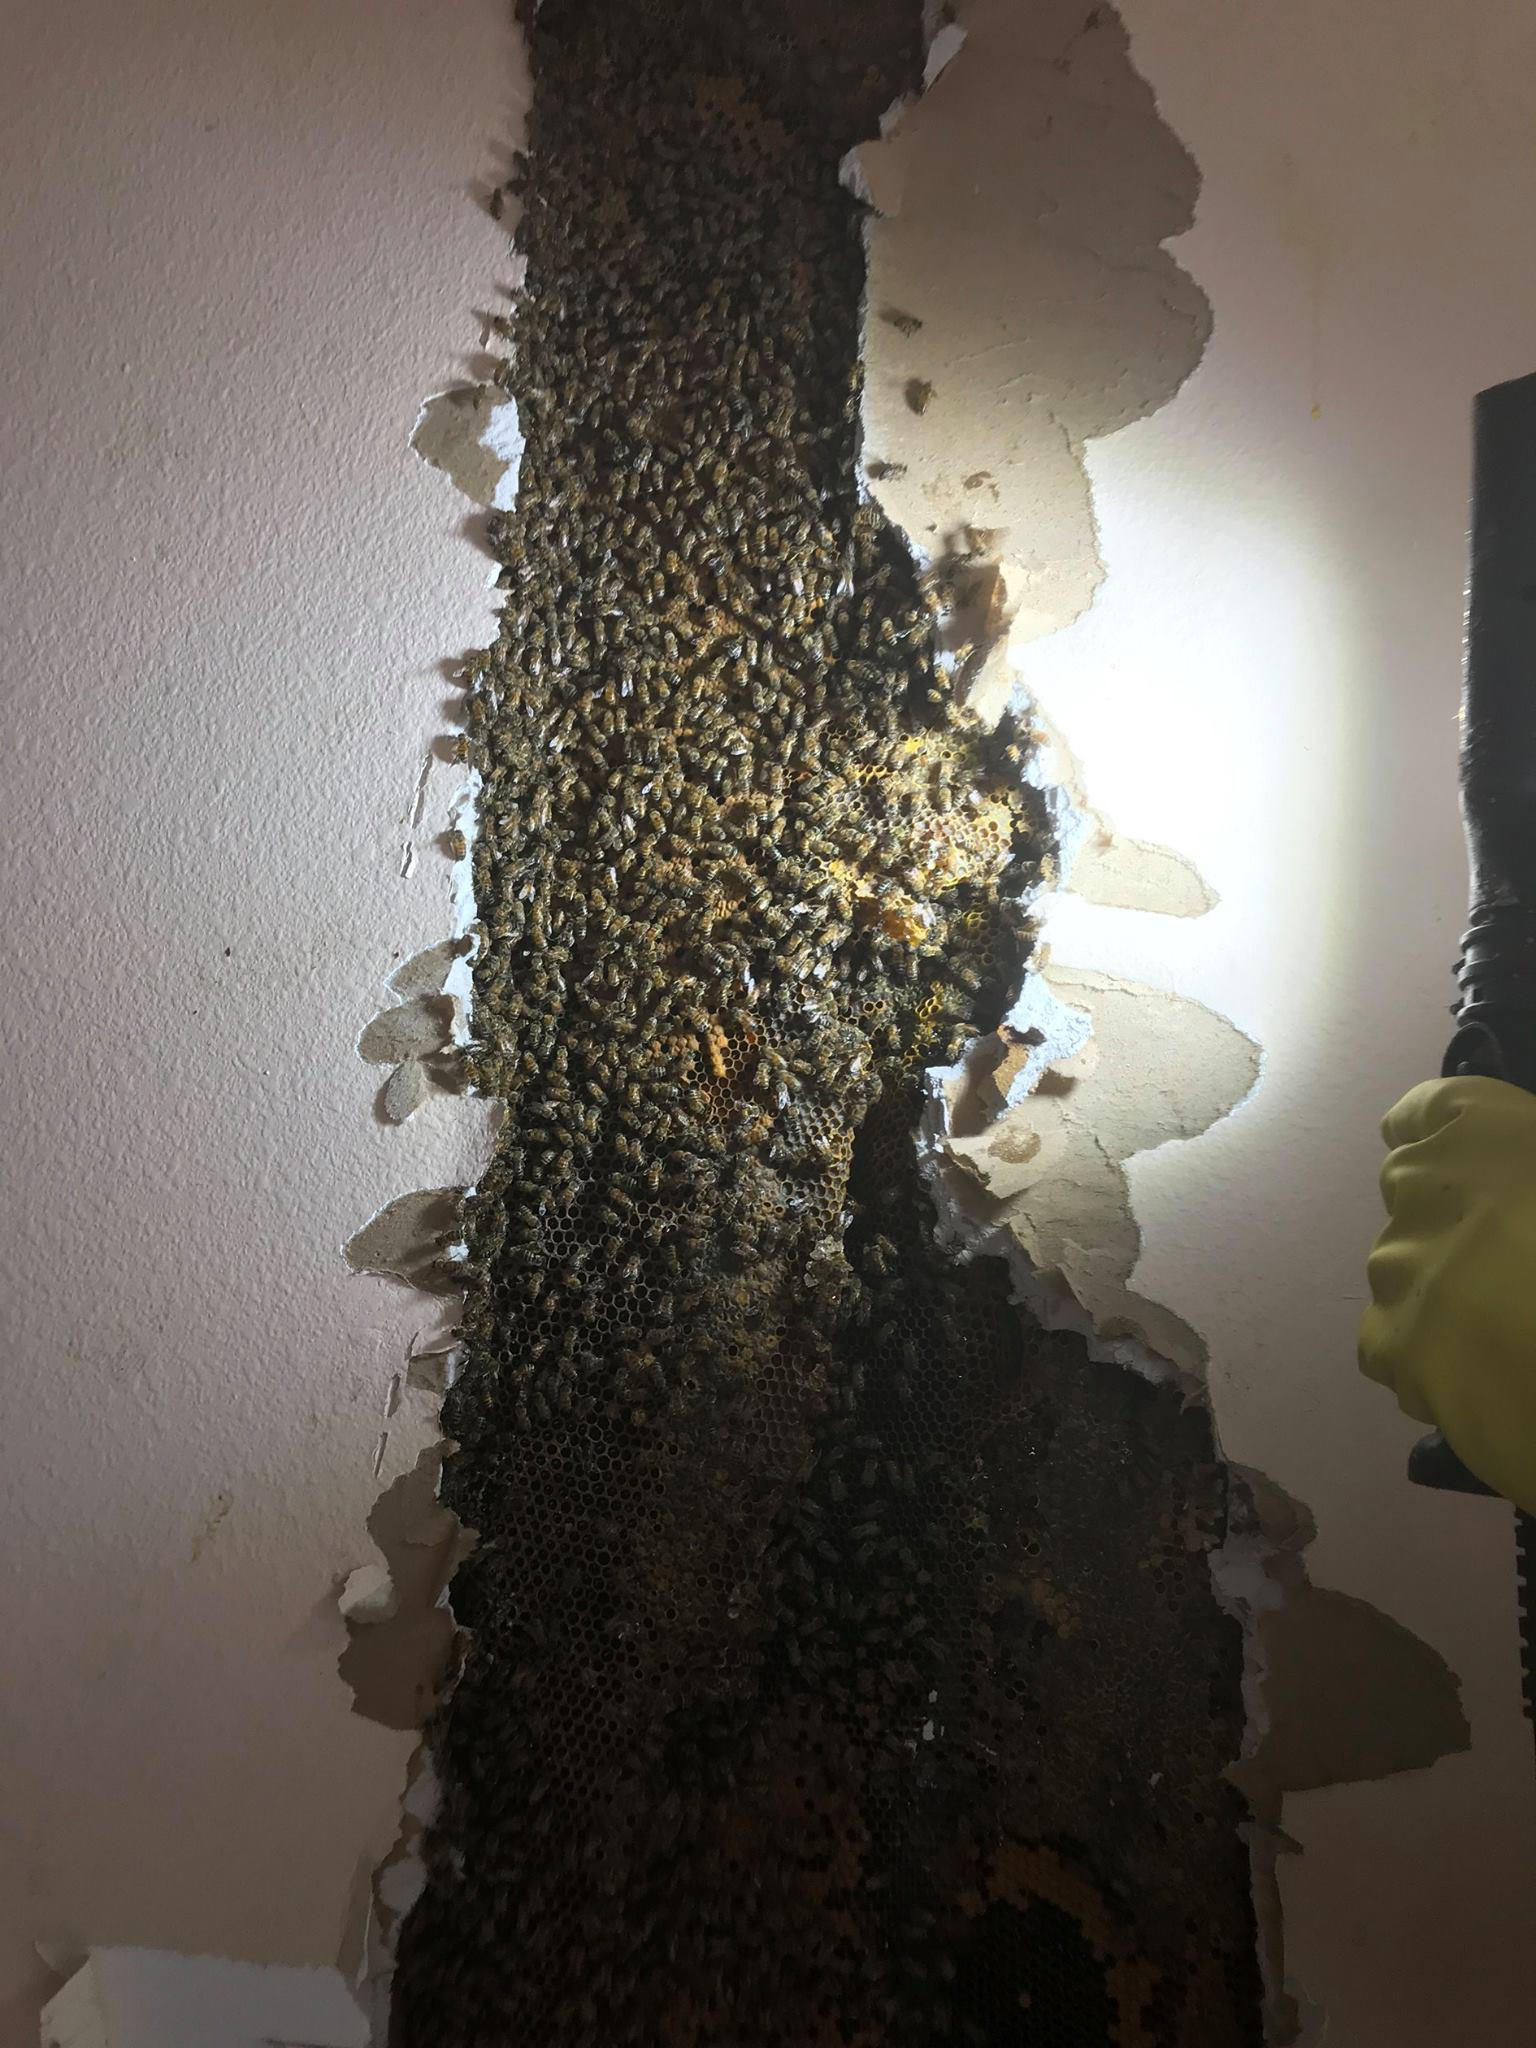 Florida Bee Investigator image 2